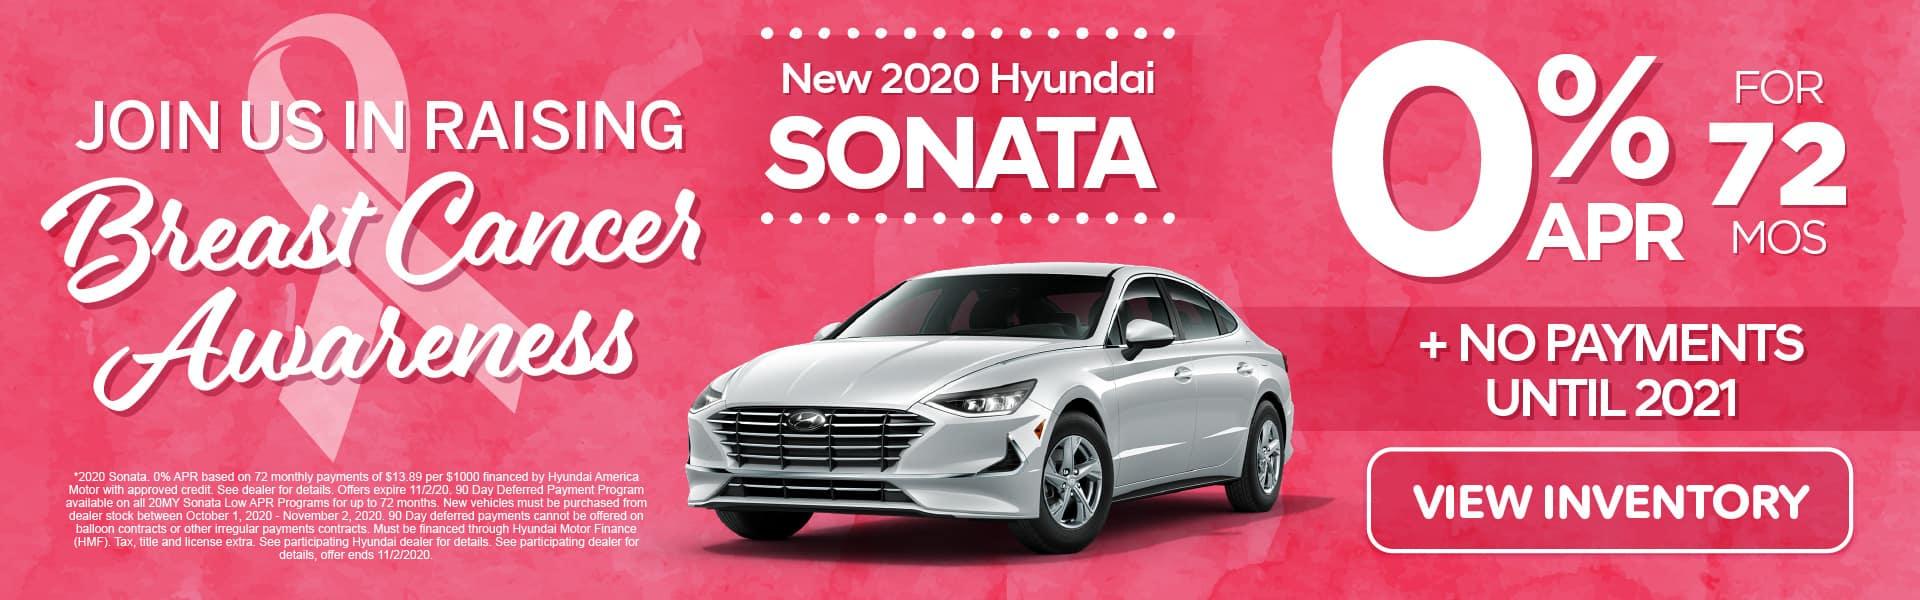 2020 Sonata 0% APR for 72 months